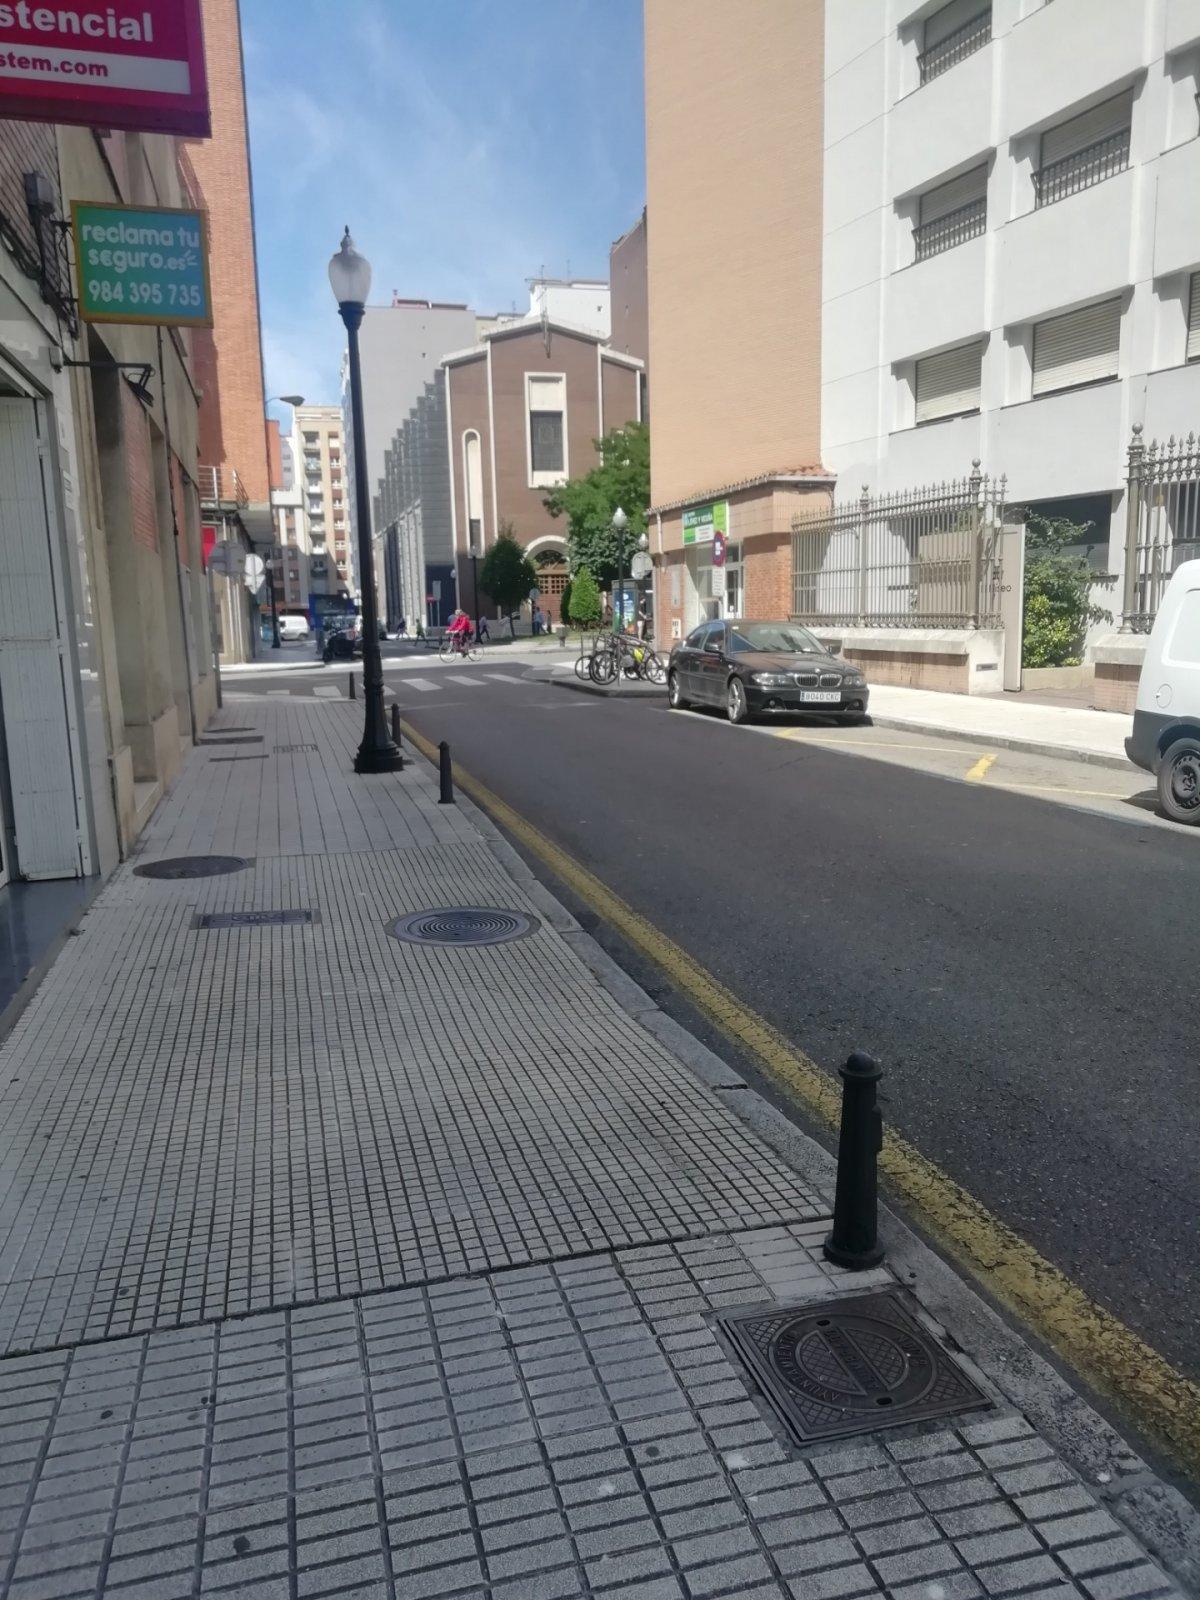 Local comercial en alquiler en Gijón